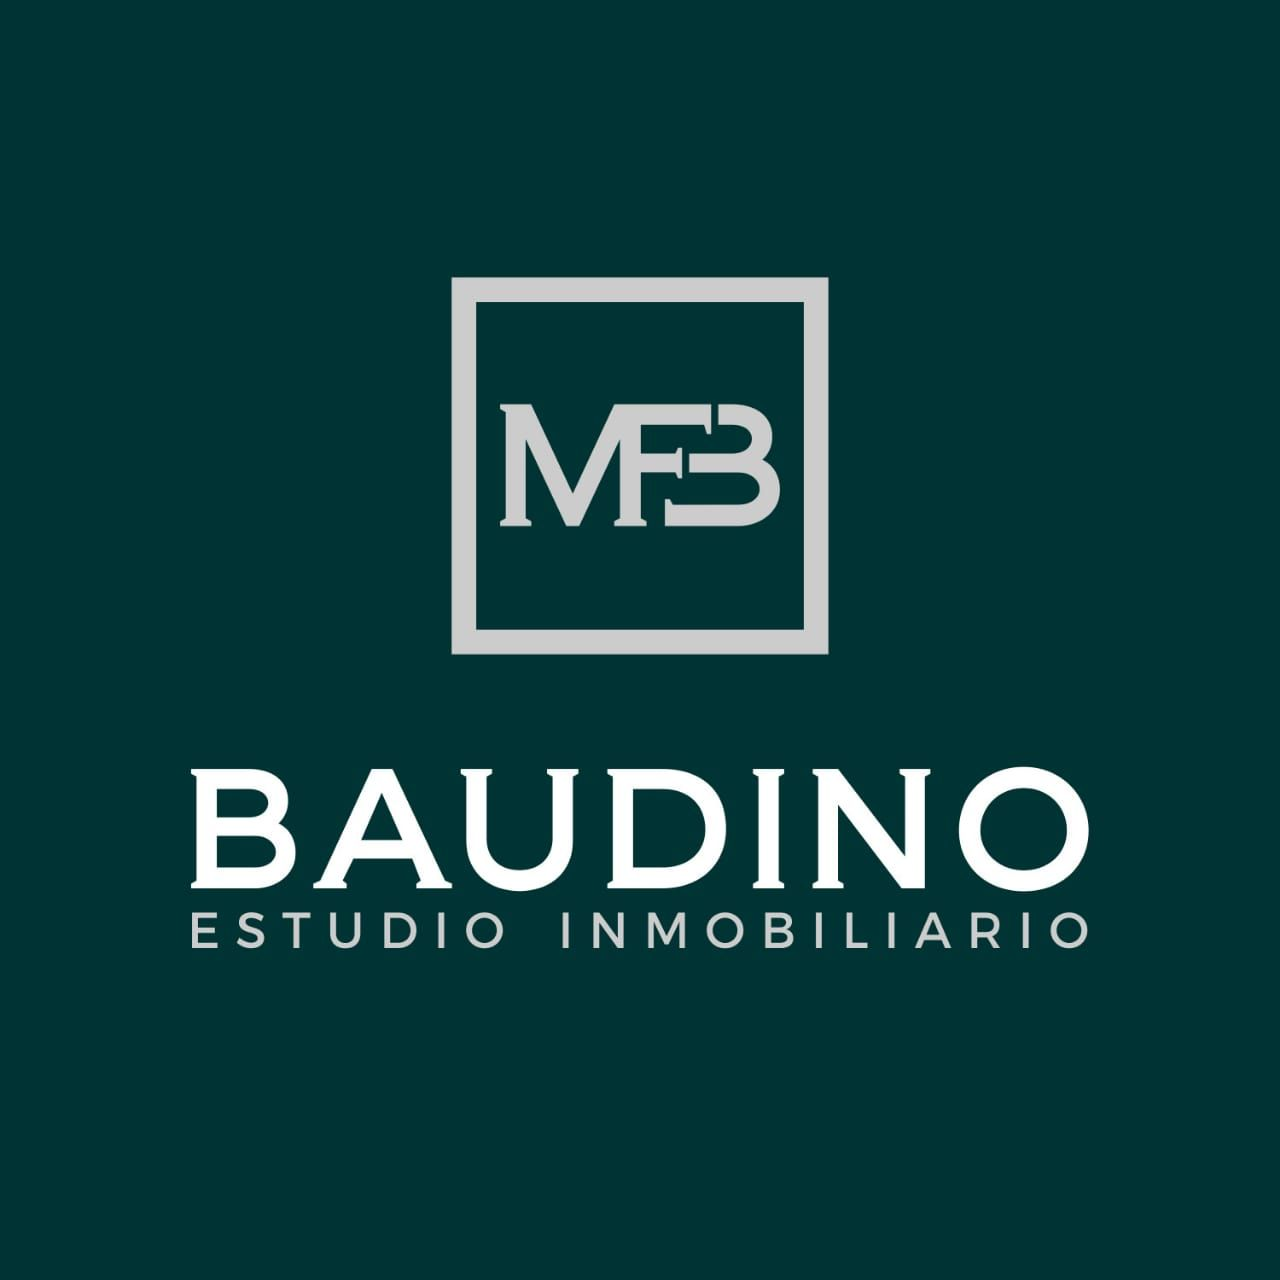 Logo de  Baudino Estudio